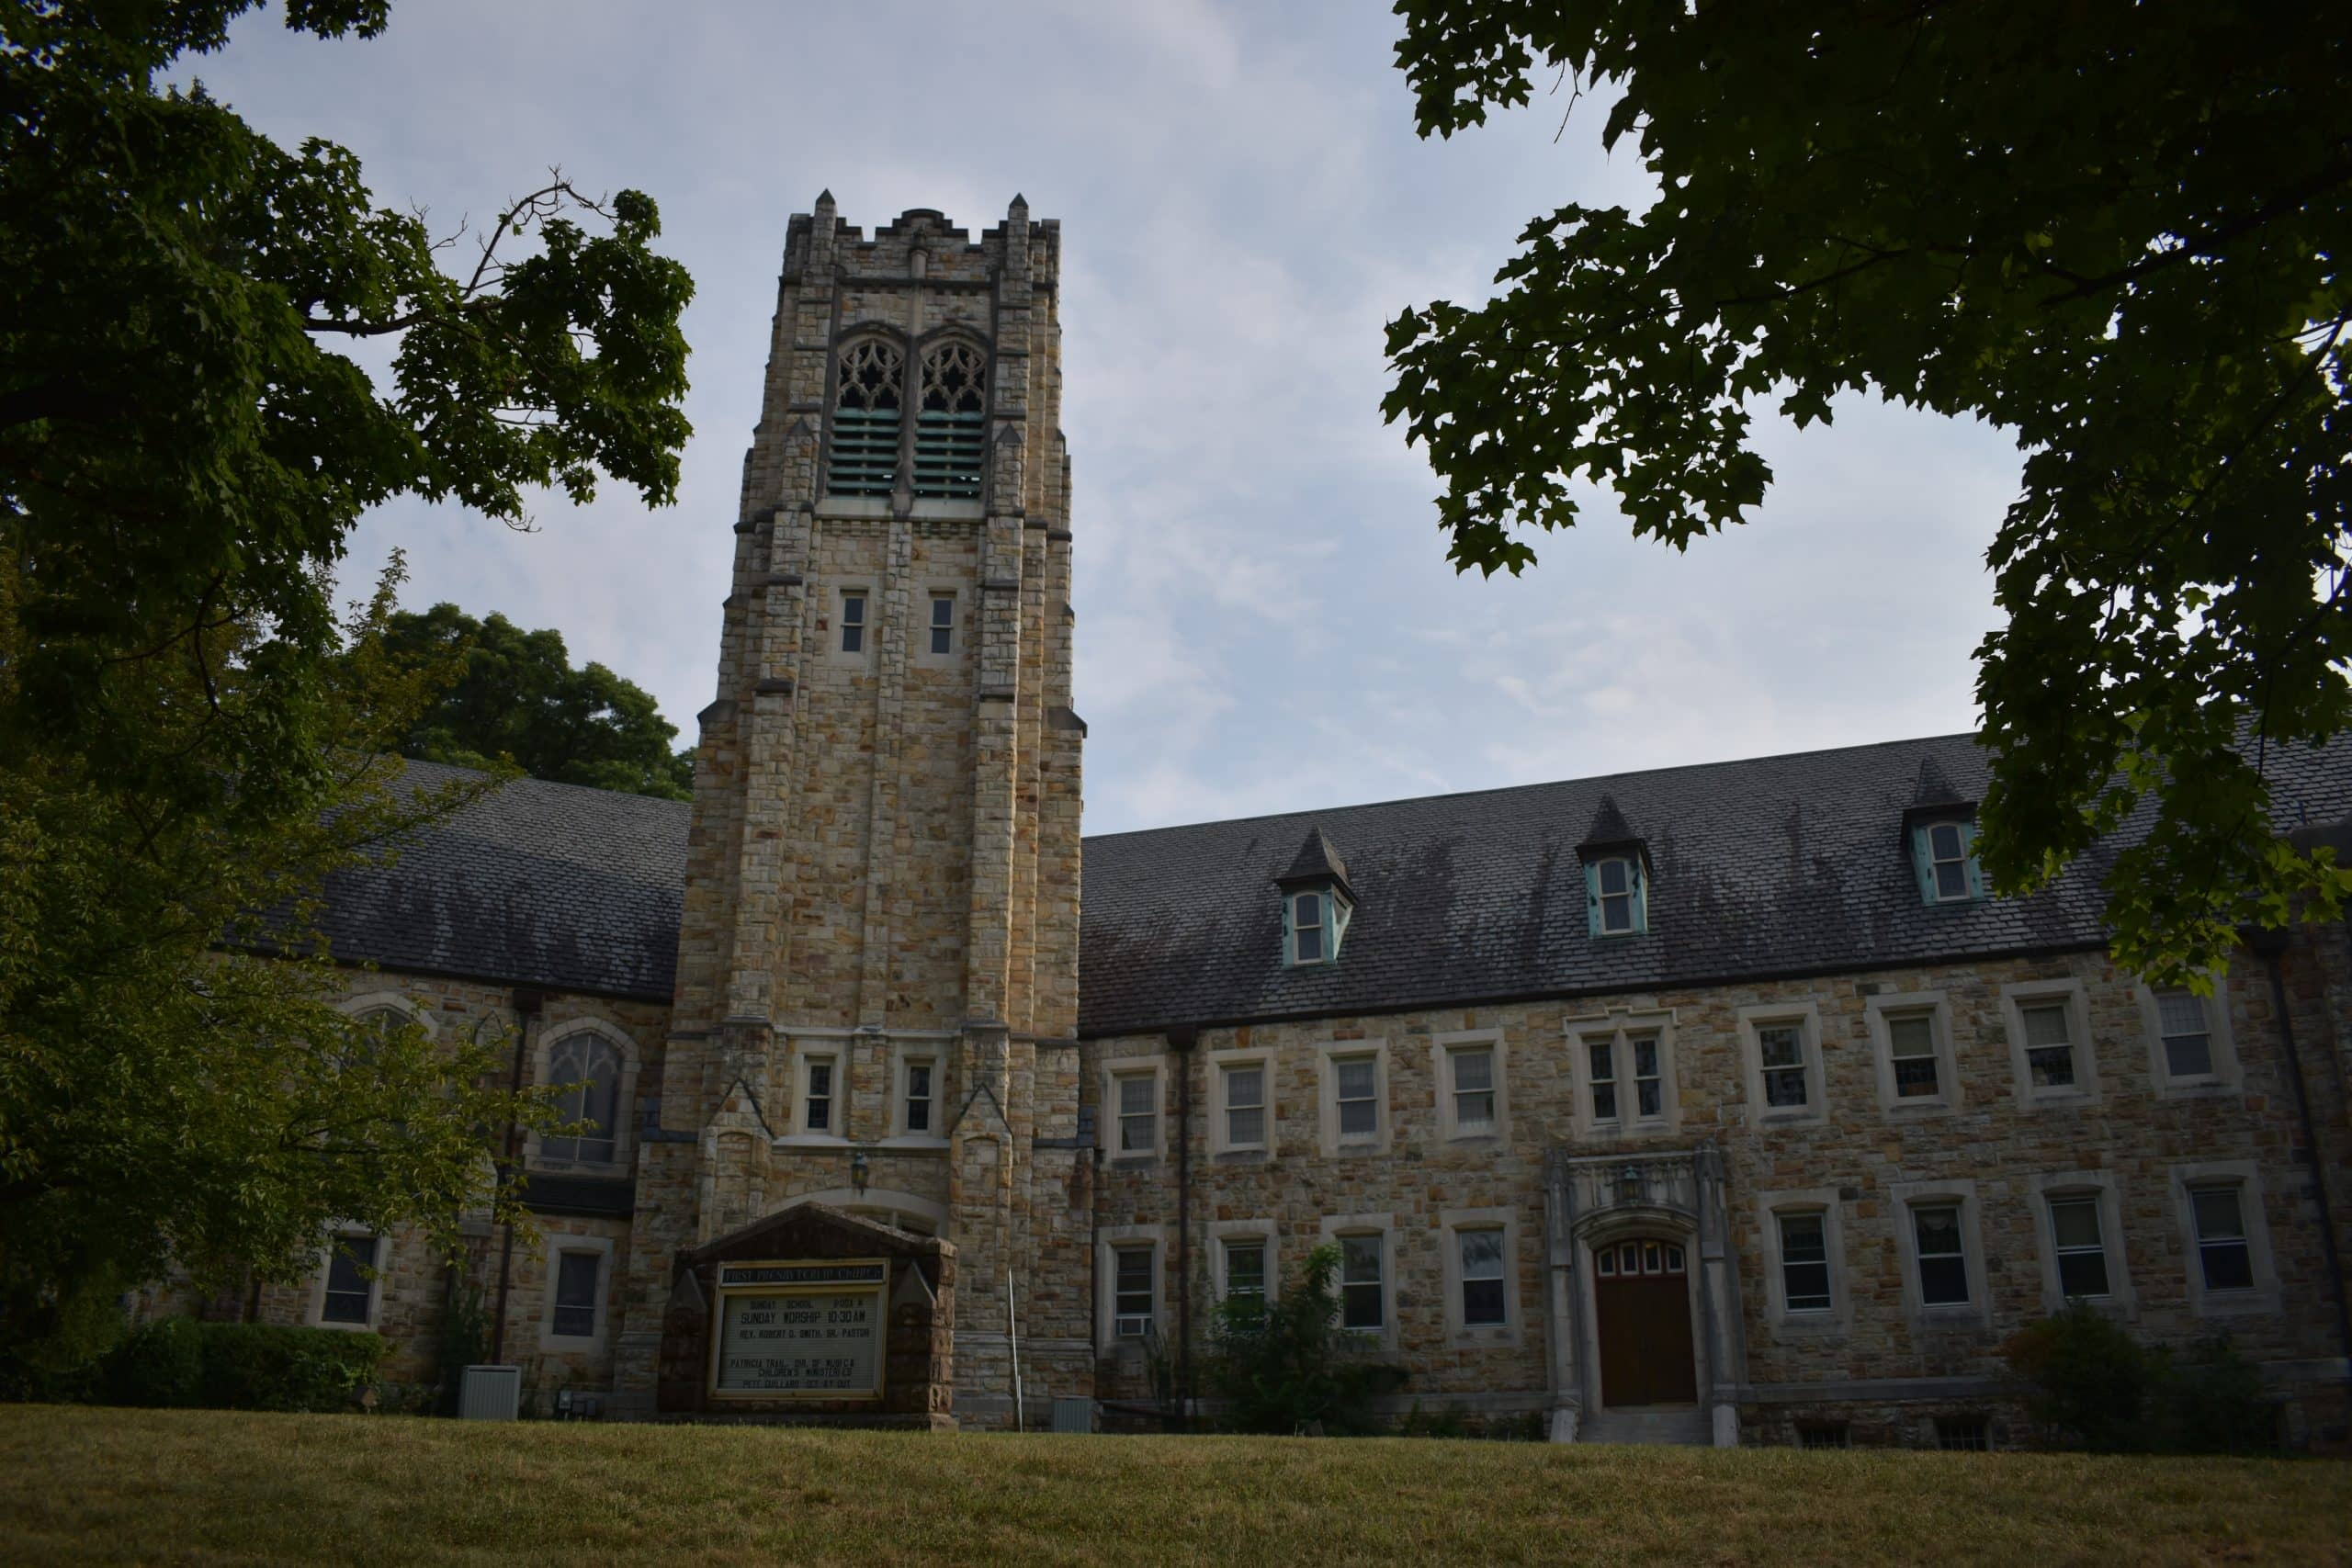 First Evangelical Presbytarian Church scaled